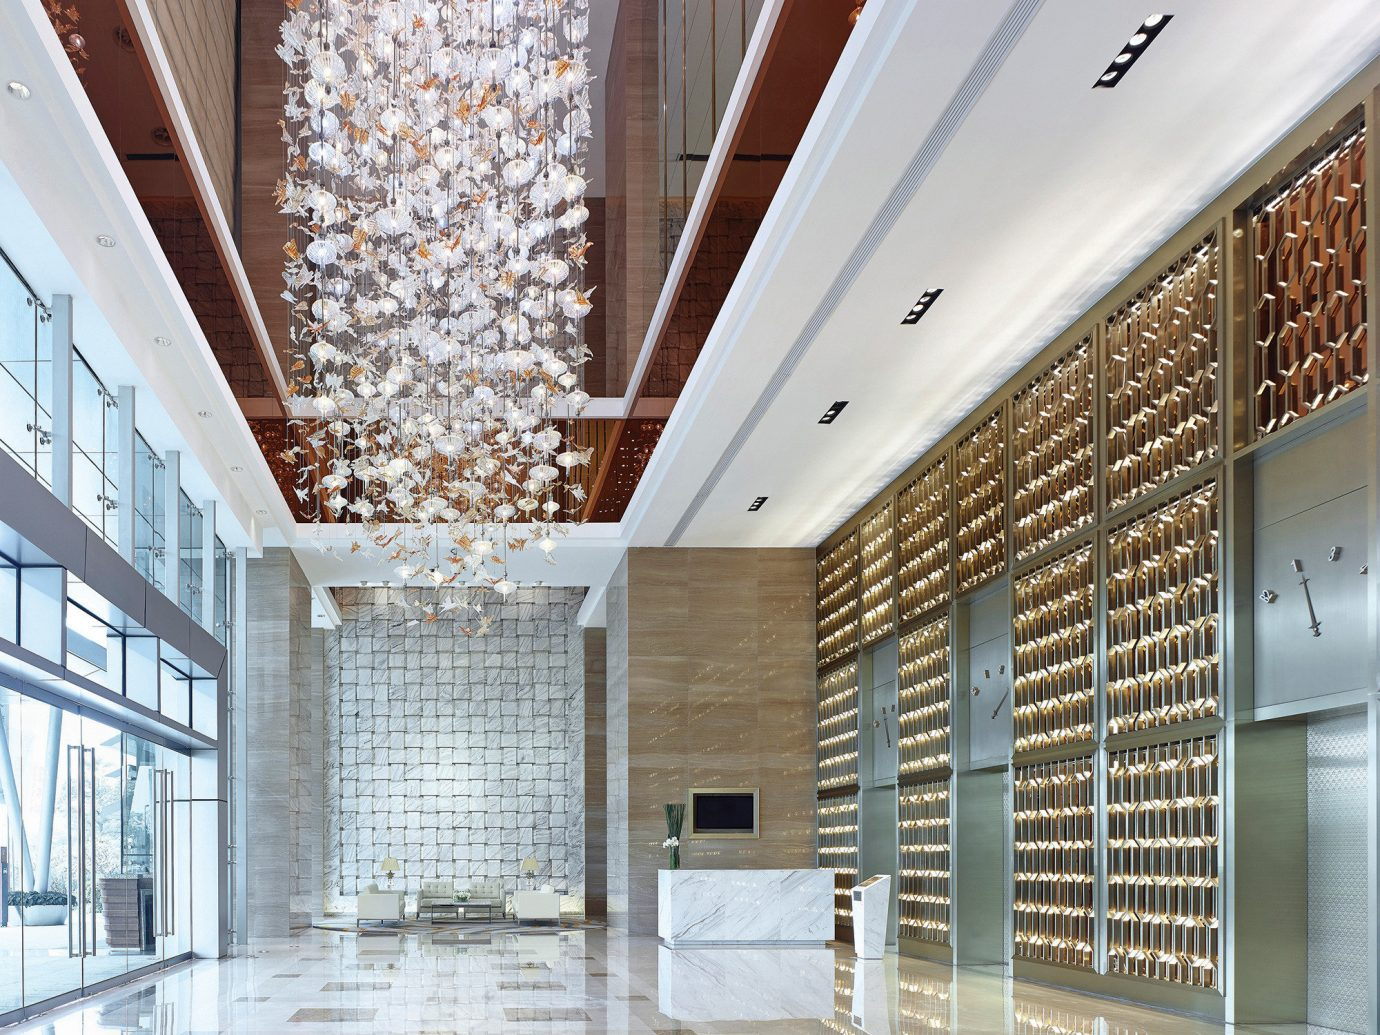 Hotels building Lobby ceiling Architecture floor interior design daylighting estate hall lighting facade headquarters flooring Design window covering